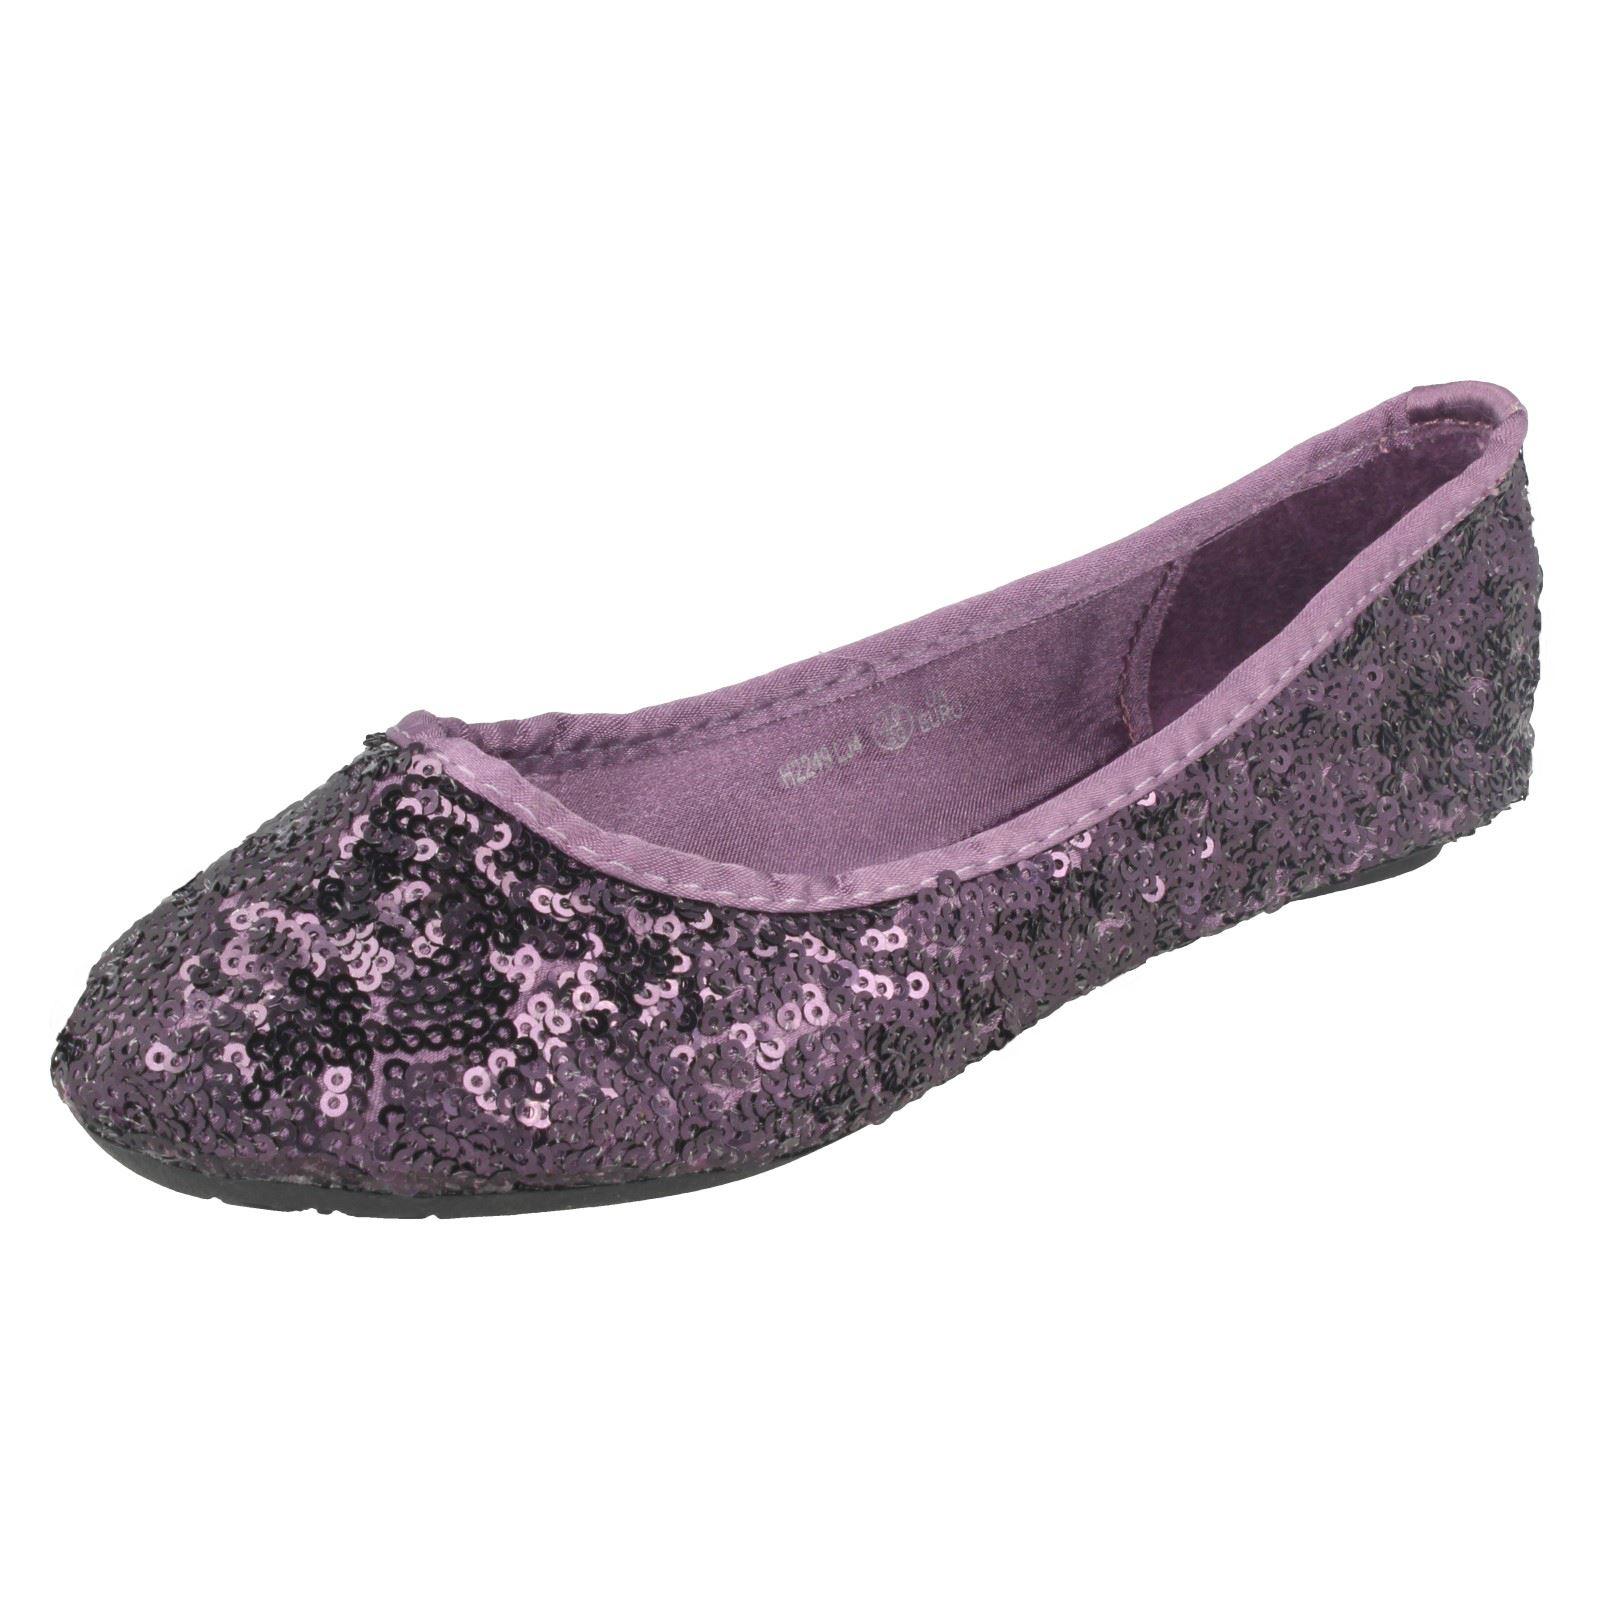 Cutie Chicas Bailarina Zapatos Planos Lentejuelas -